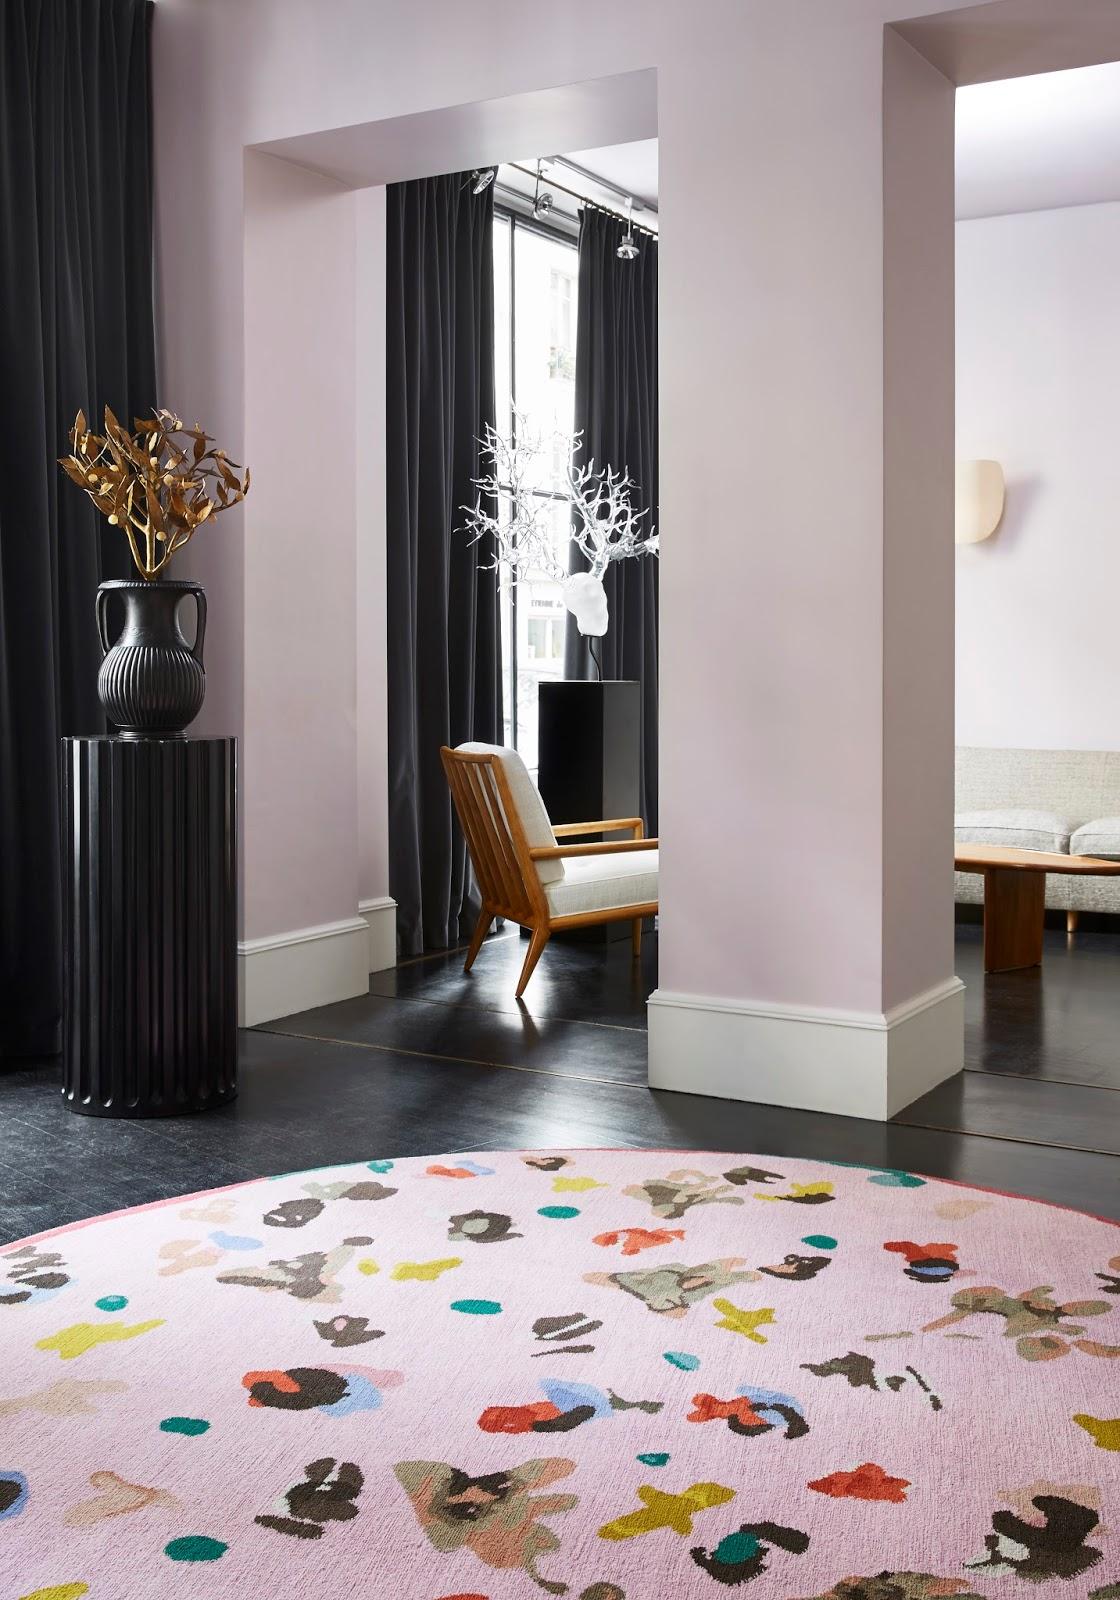 paris design week 2016 idylle von christian b rard manufacture cogolin. Black Bedroom Furniture Sets. Home Design Ideas